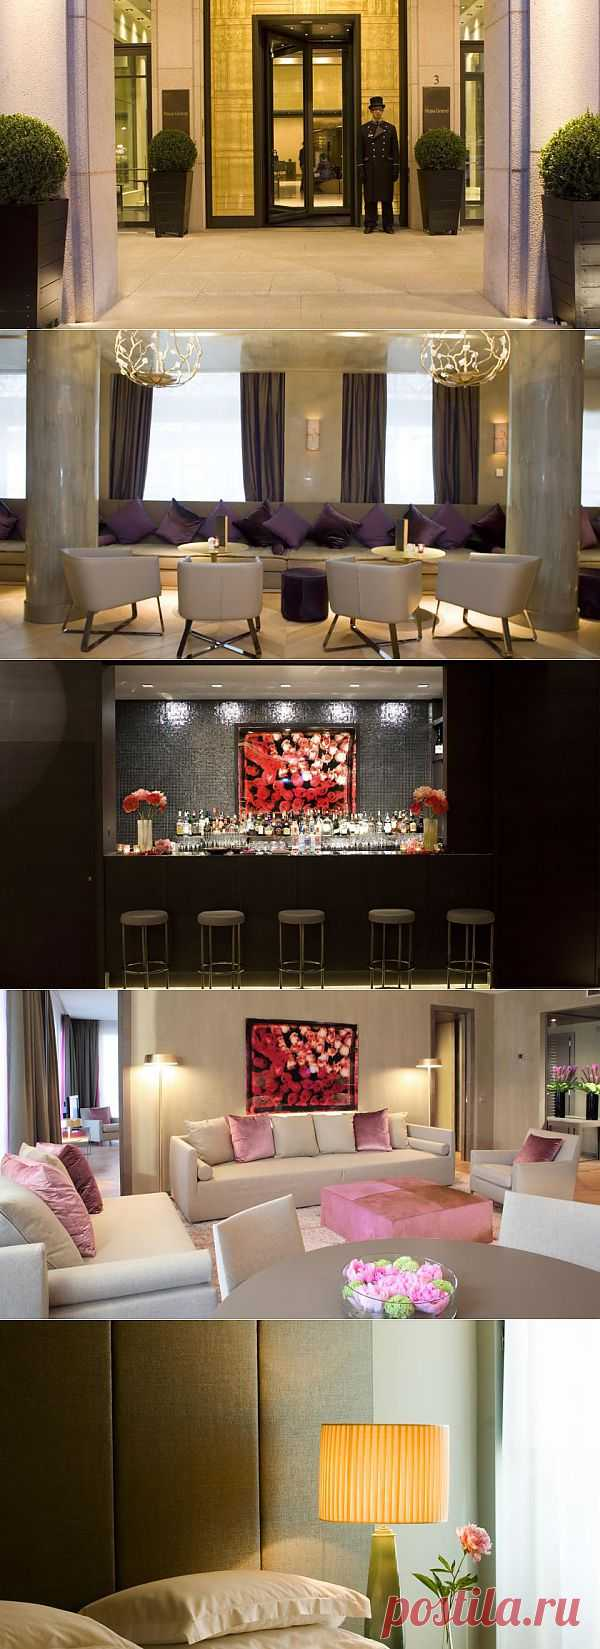 Booking.com : Starhotels Rosa Grand , Милан, Италия